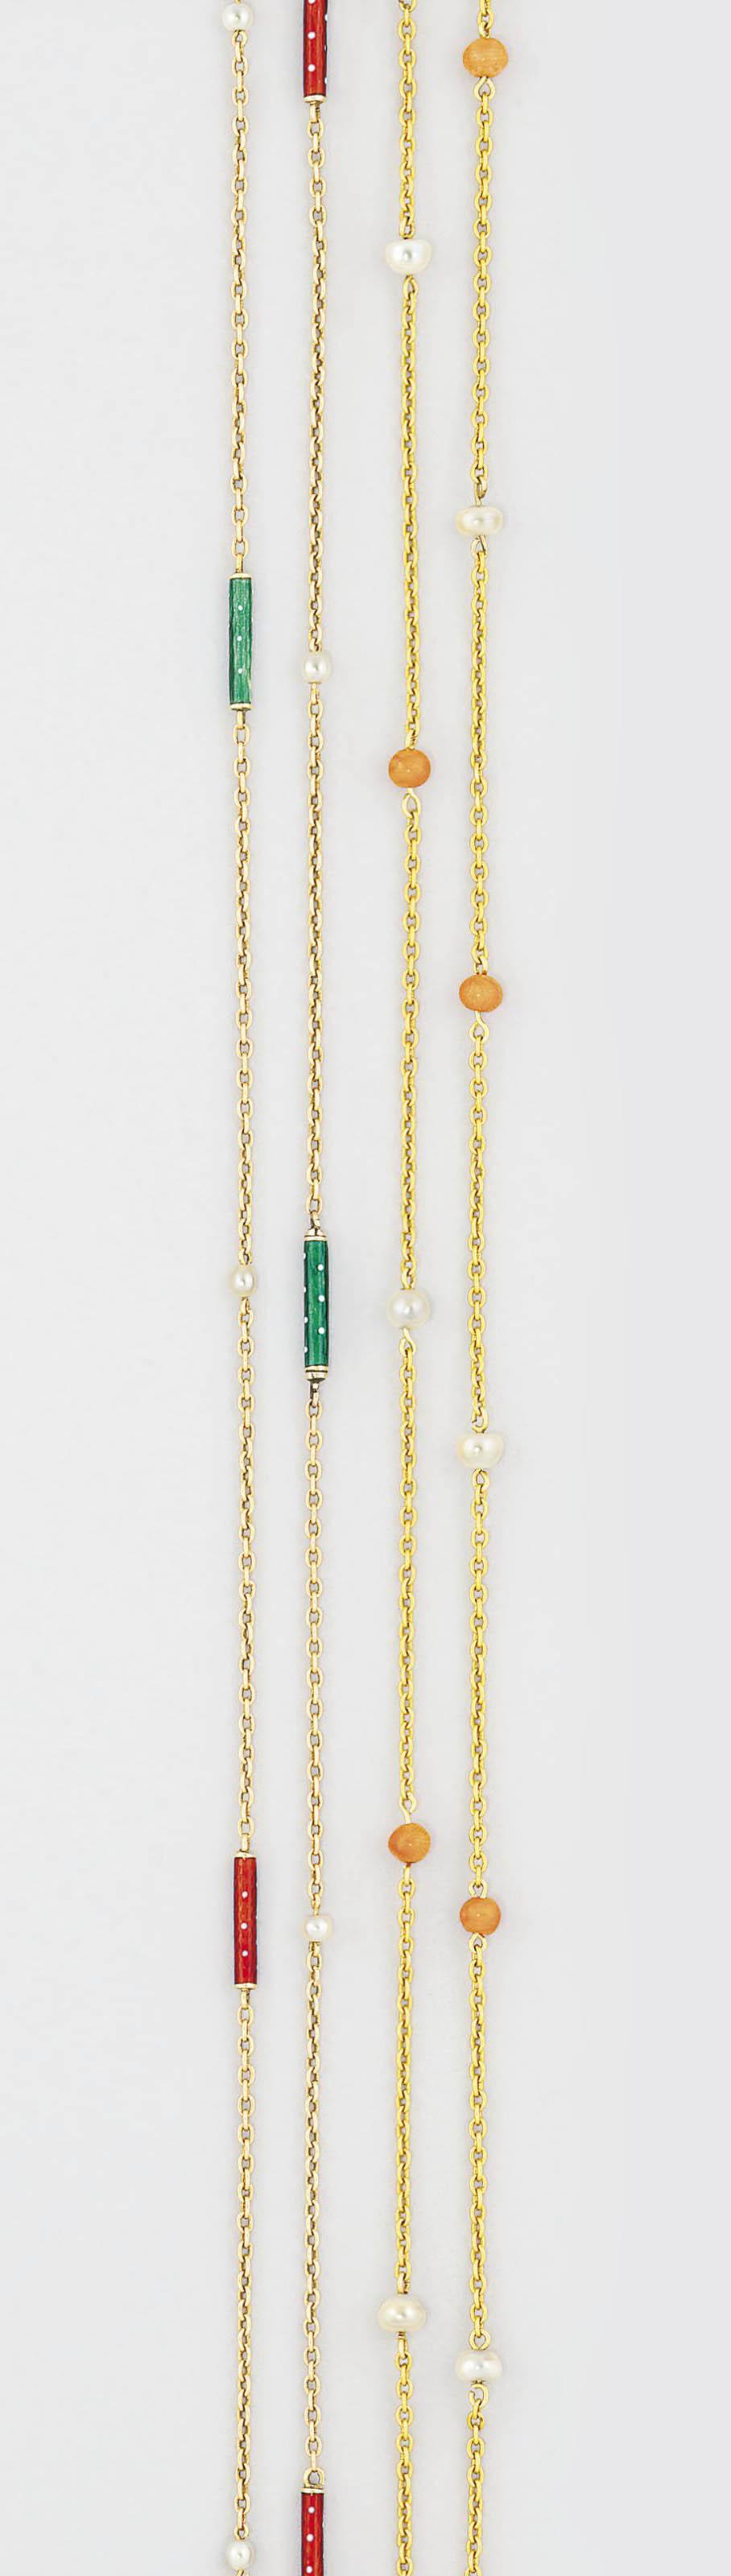 Two Edwardian gold guard chain